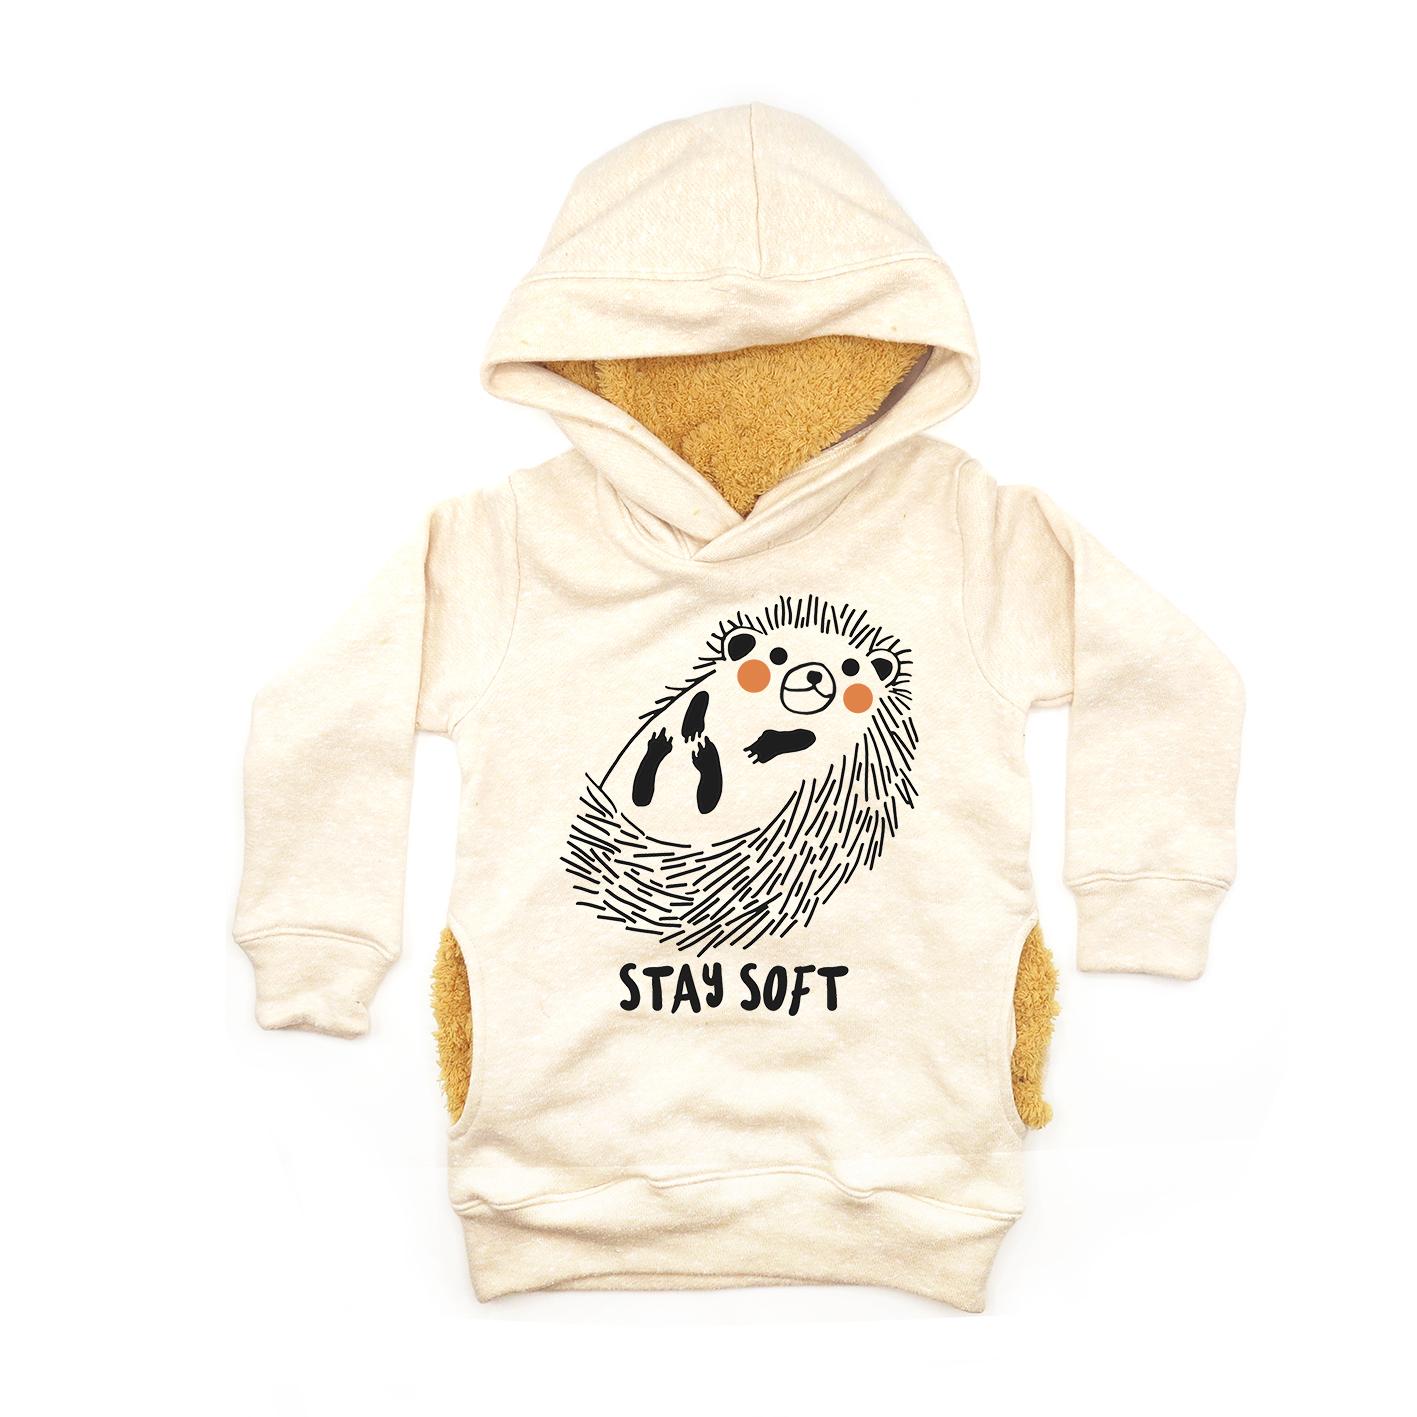 BABY & KIDS 3M.-7Y LP03102 STAY SOFT HOODIE SWEATER